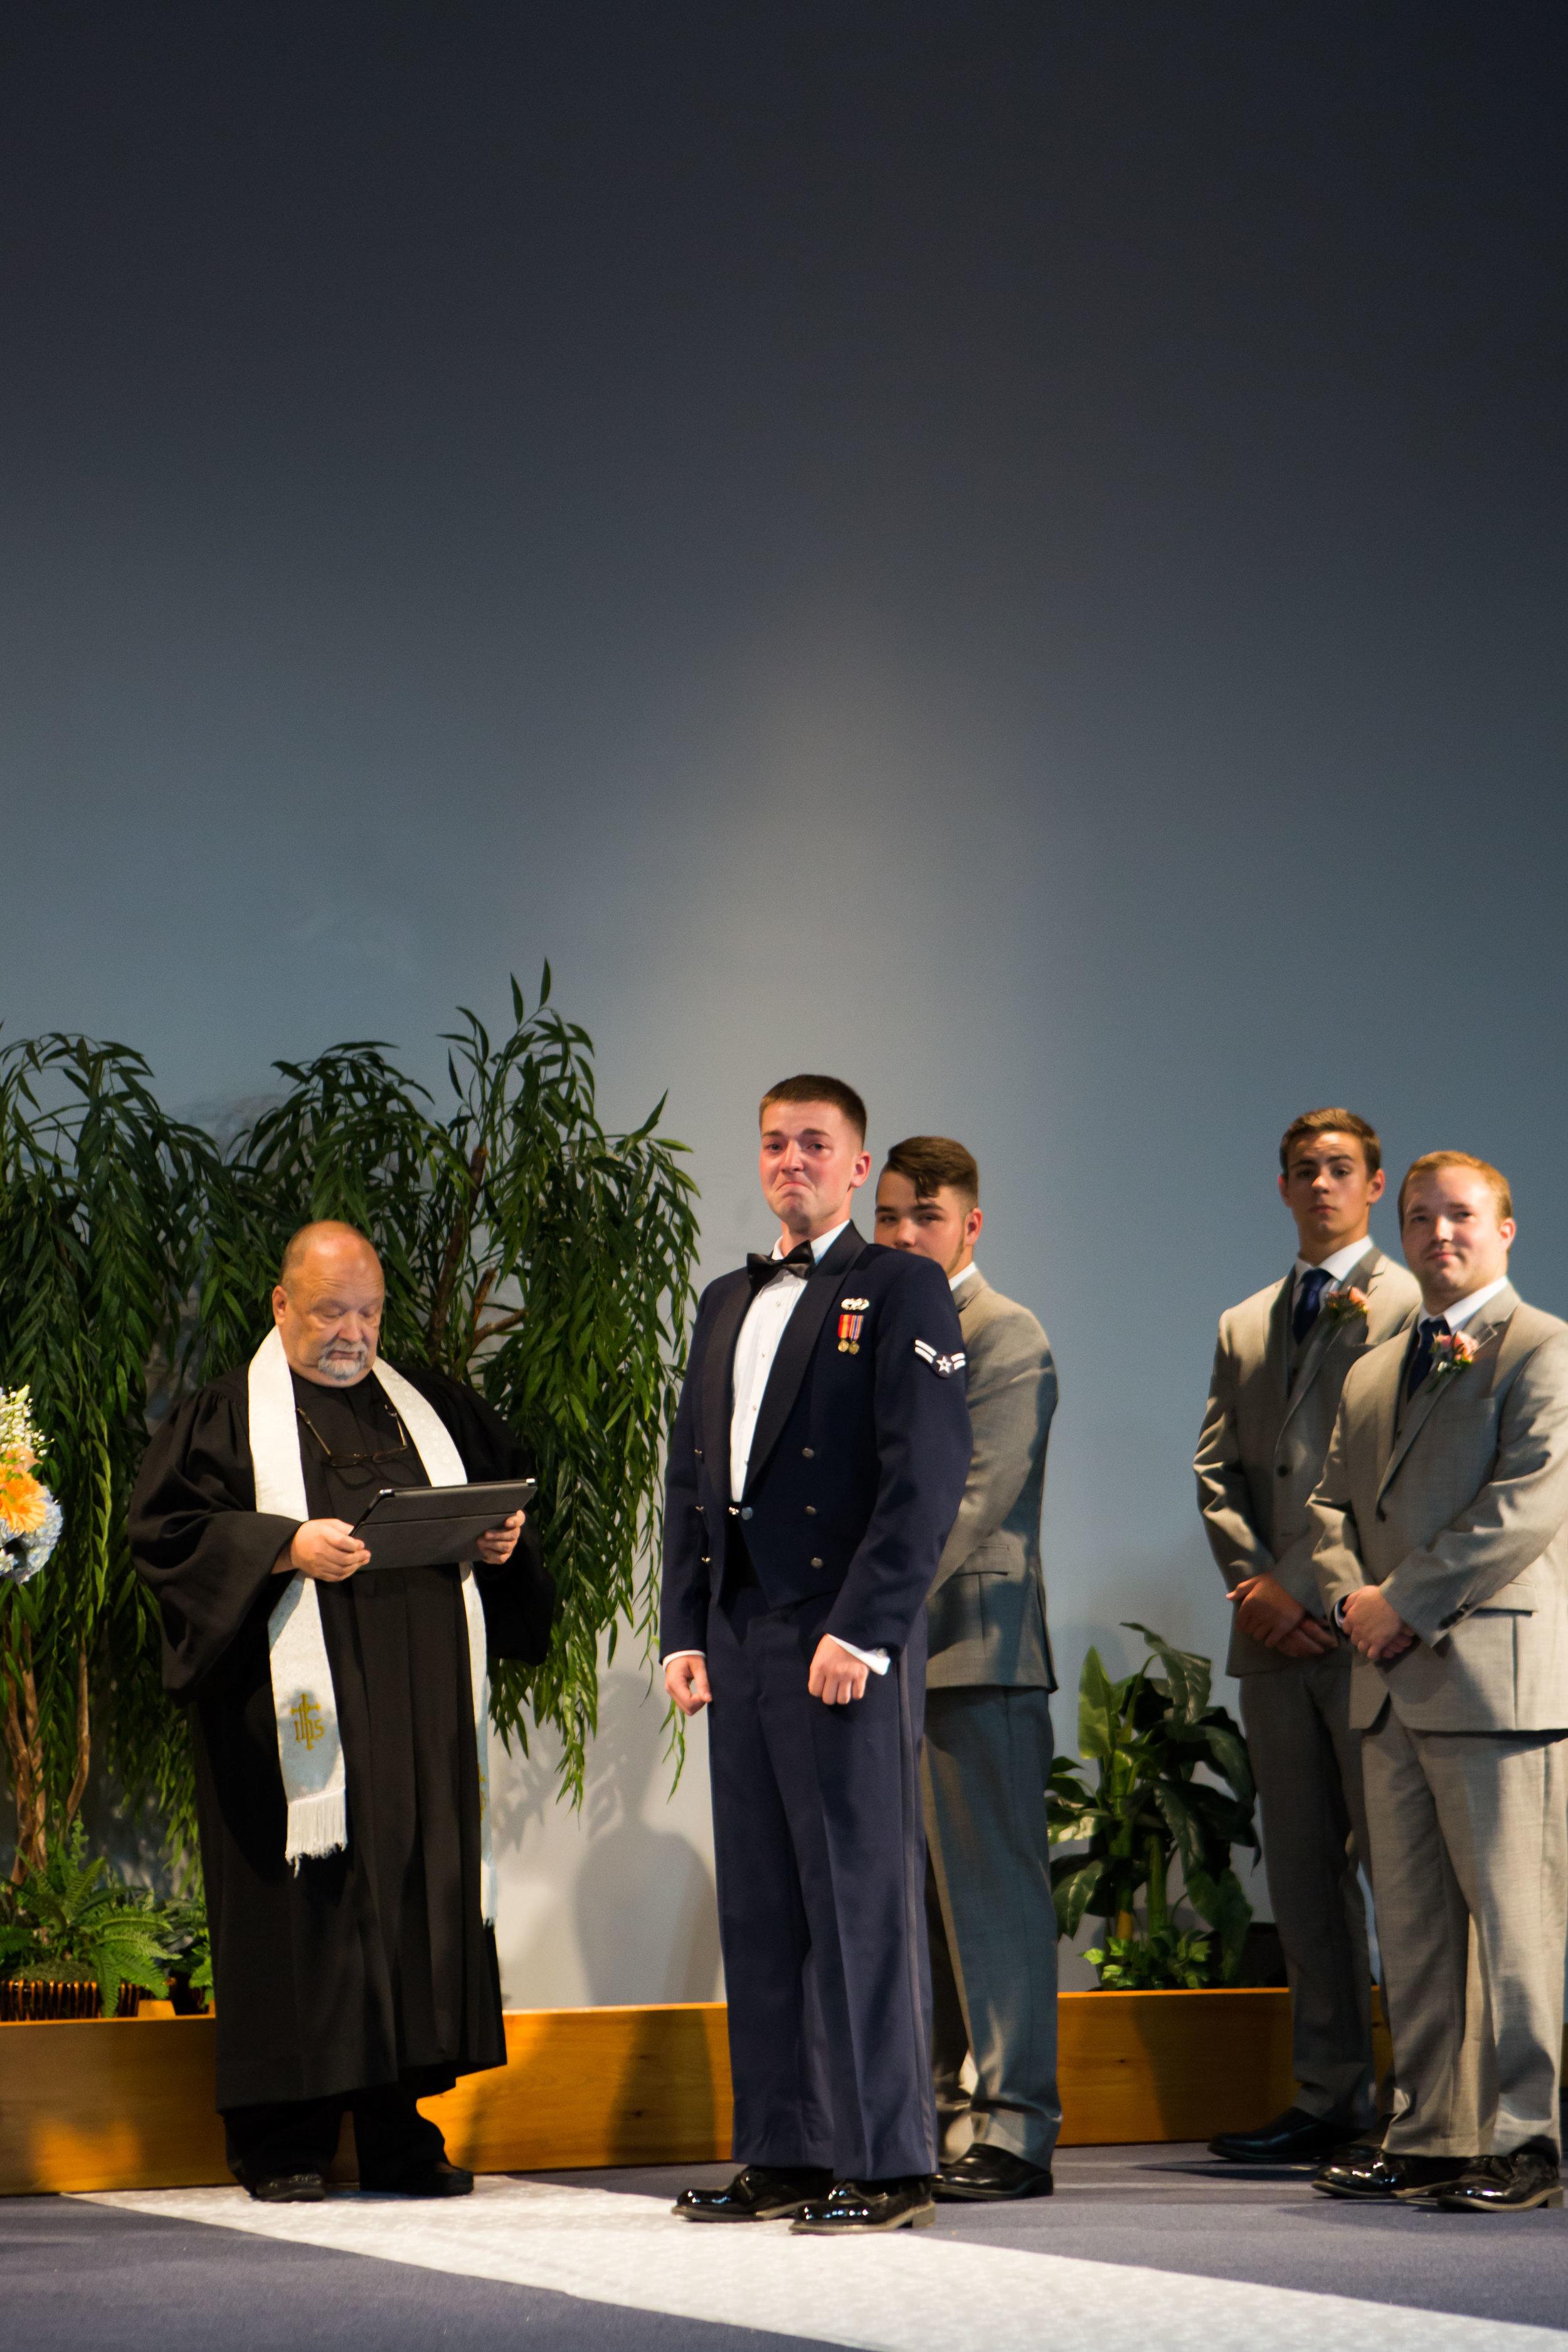 060416_Norris_Smith_Wedding_CF_11930.jpg